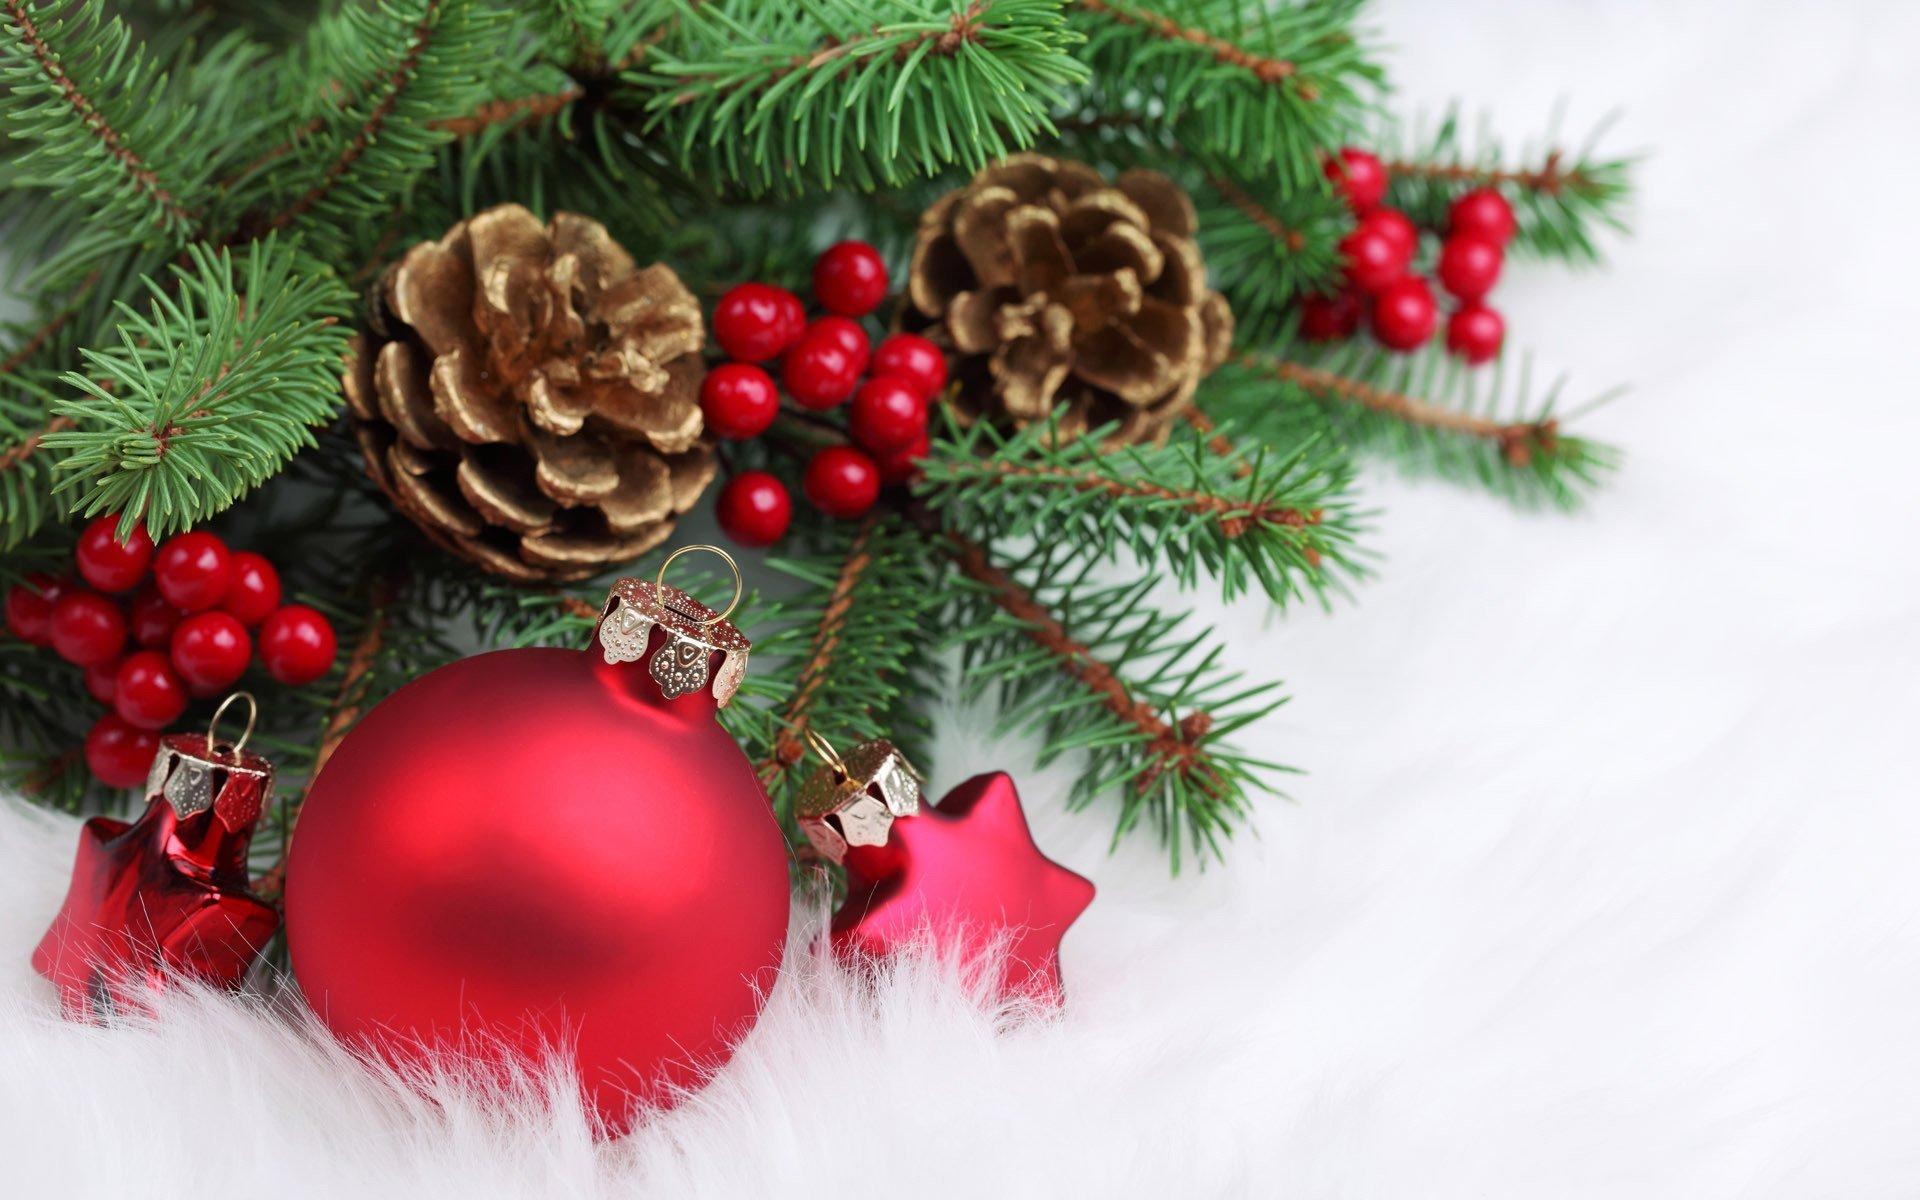 christmas wallpapers for mobile9999999999999999999999